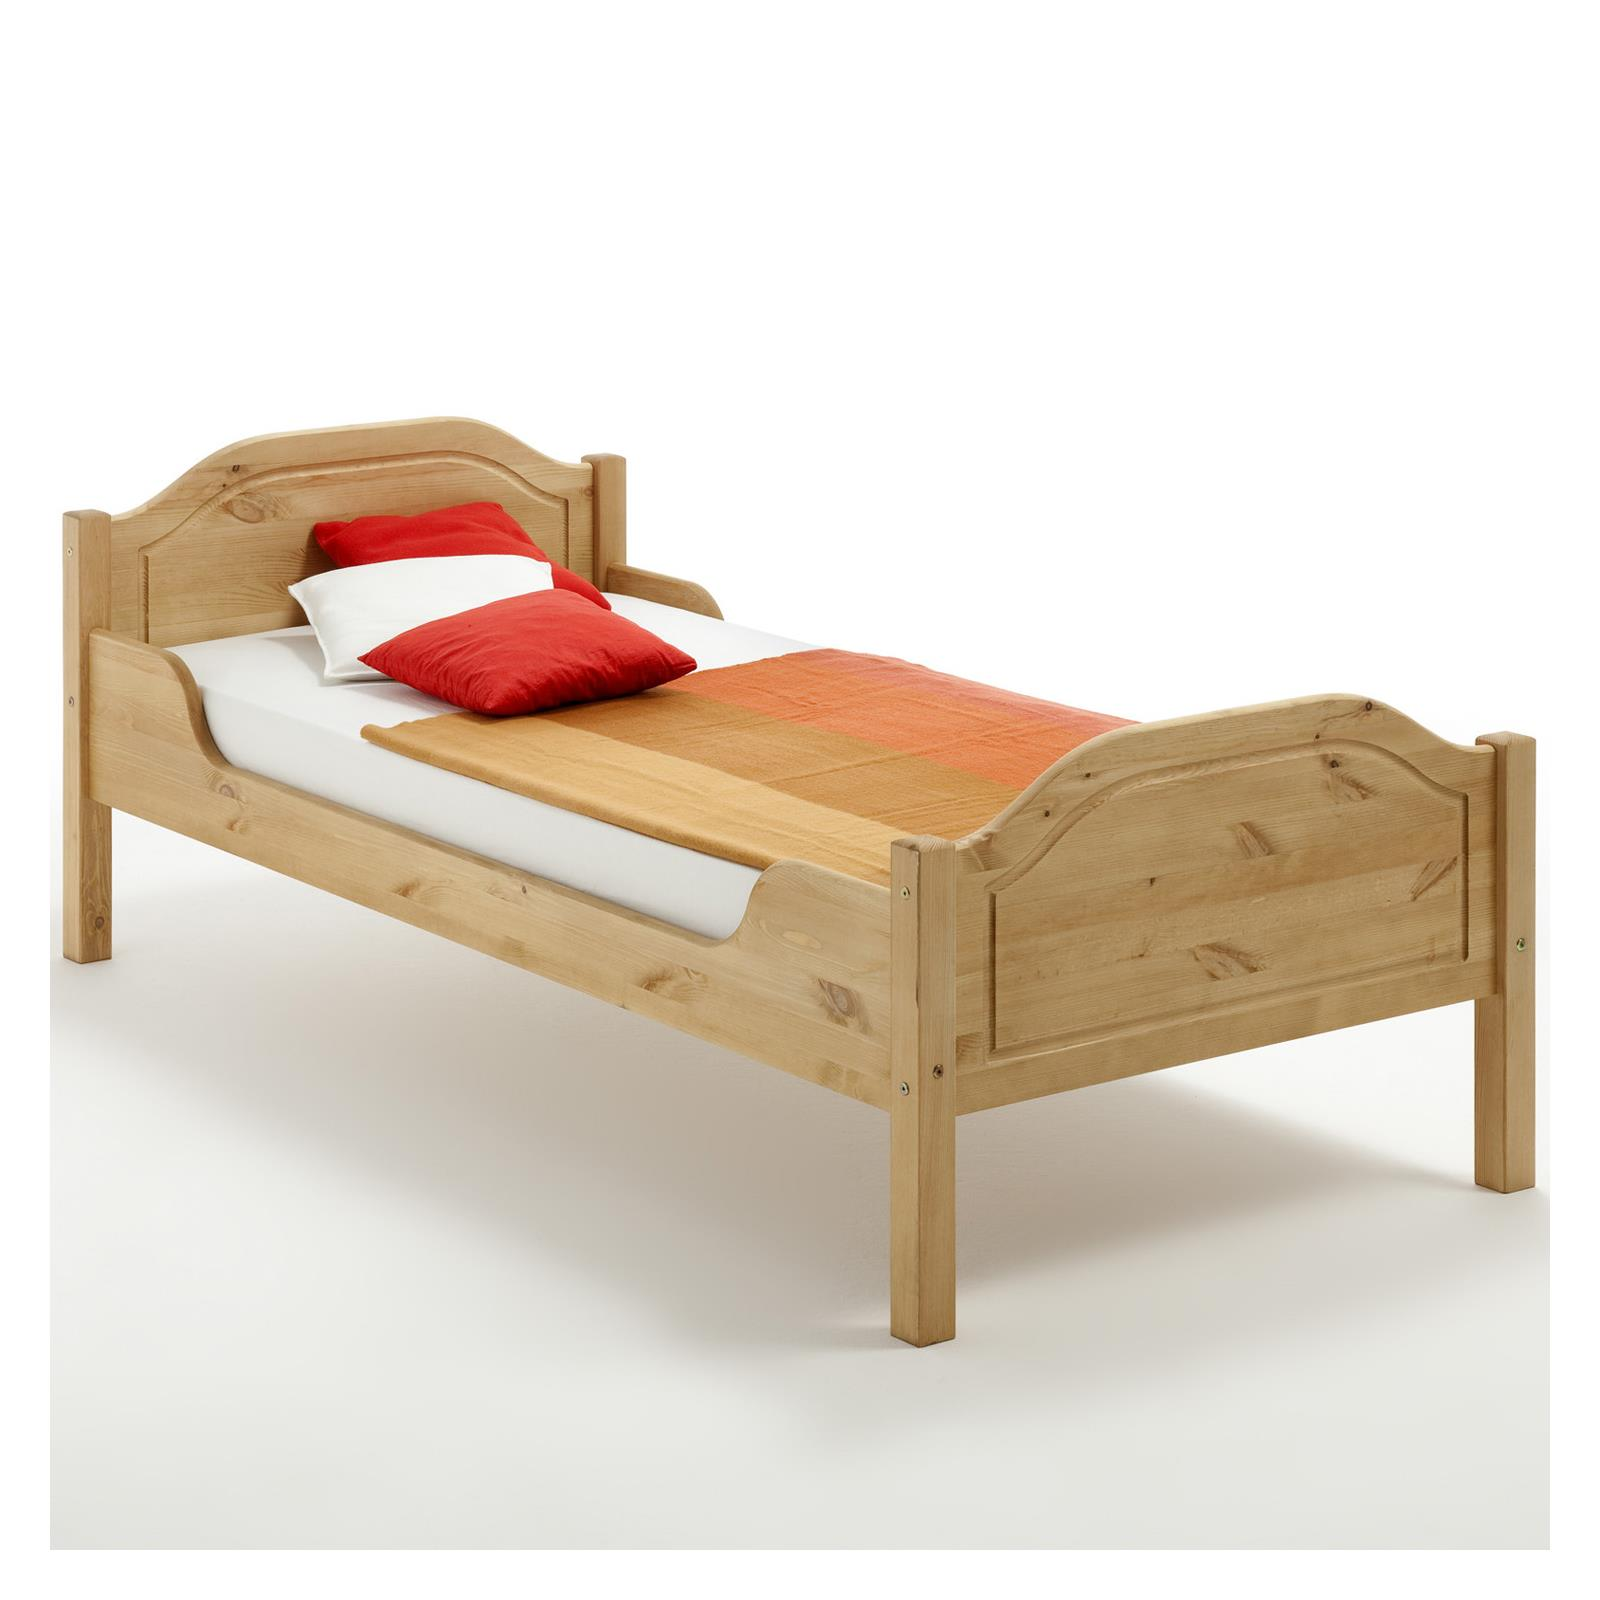 holzbett landhausbett einzelbett doppelbett kiefer massiv. Black Bedroom Furniture Sets. Home Design Ideas